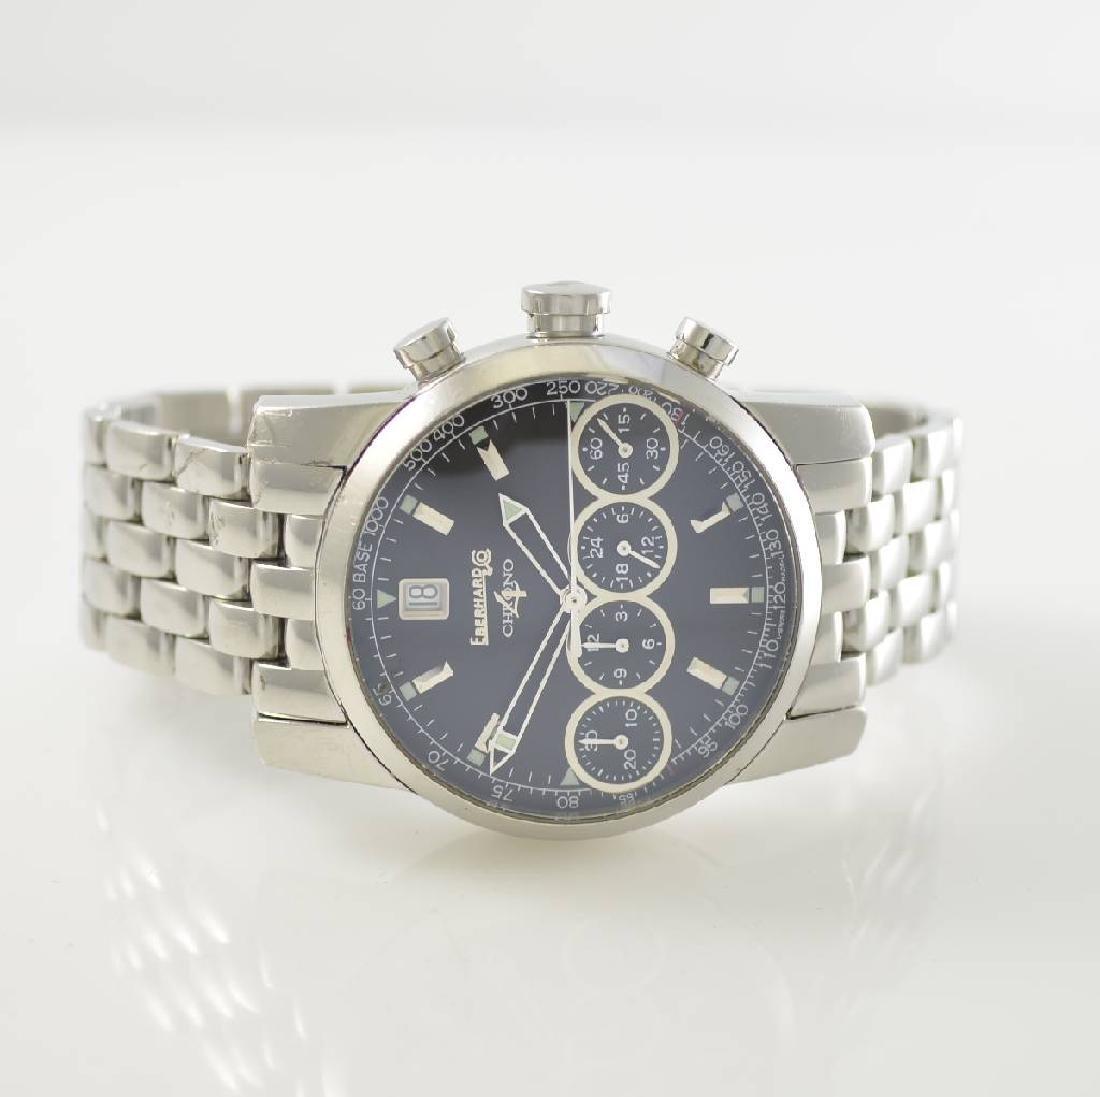 EBERHARD Chrono-4 gents wristwatch with chronograph